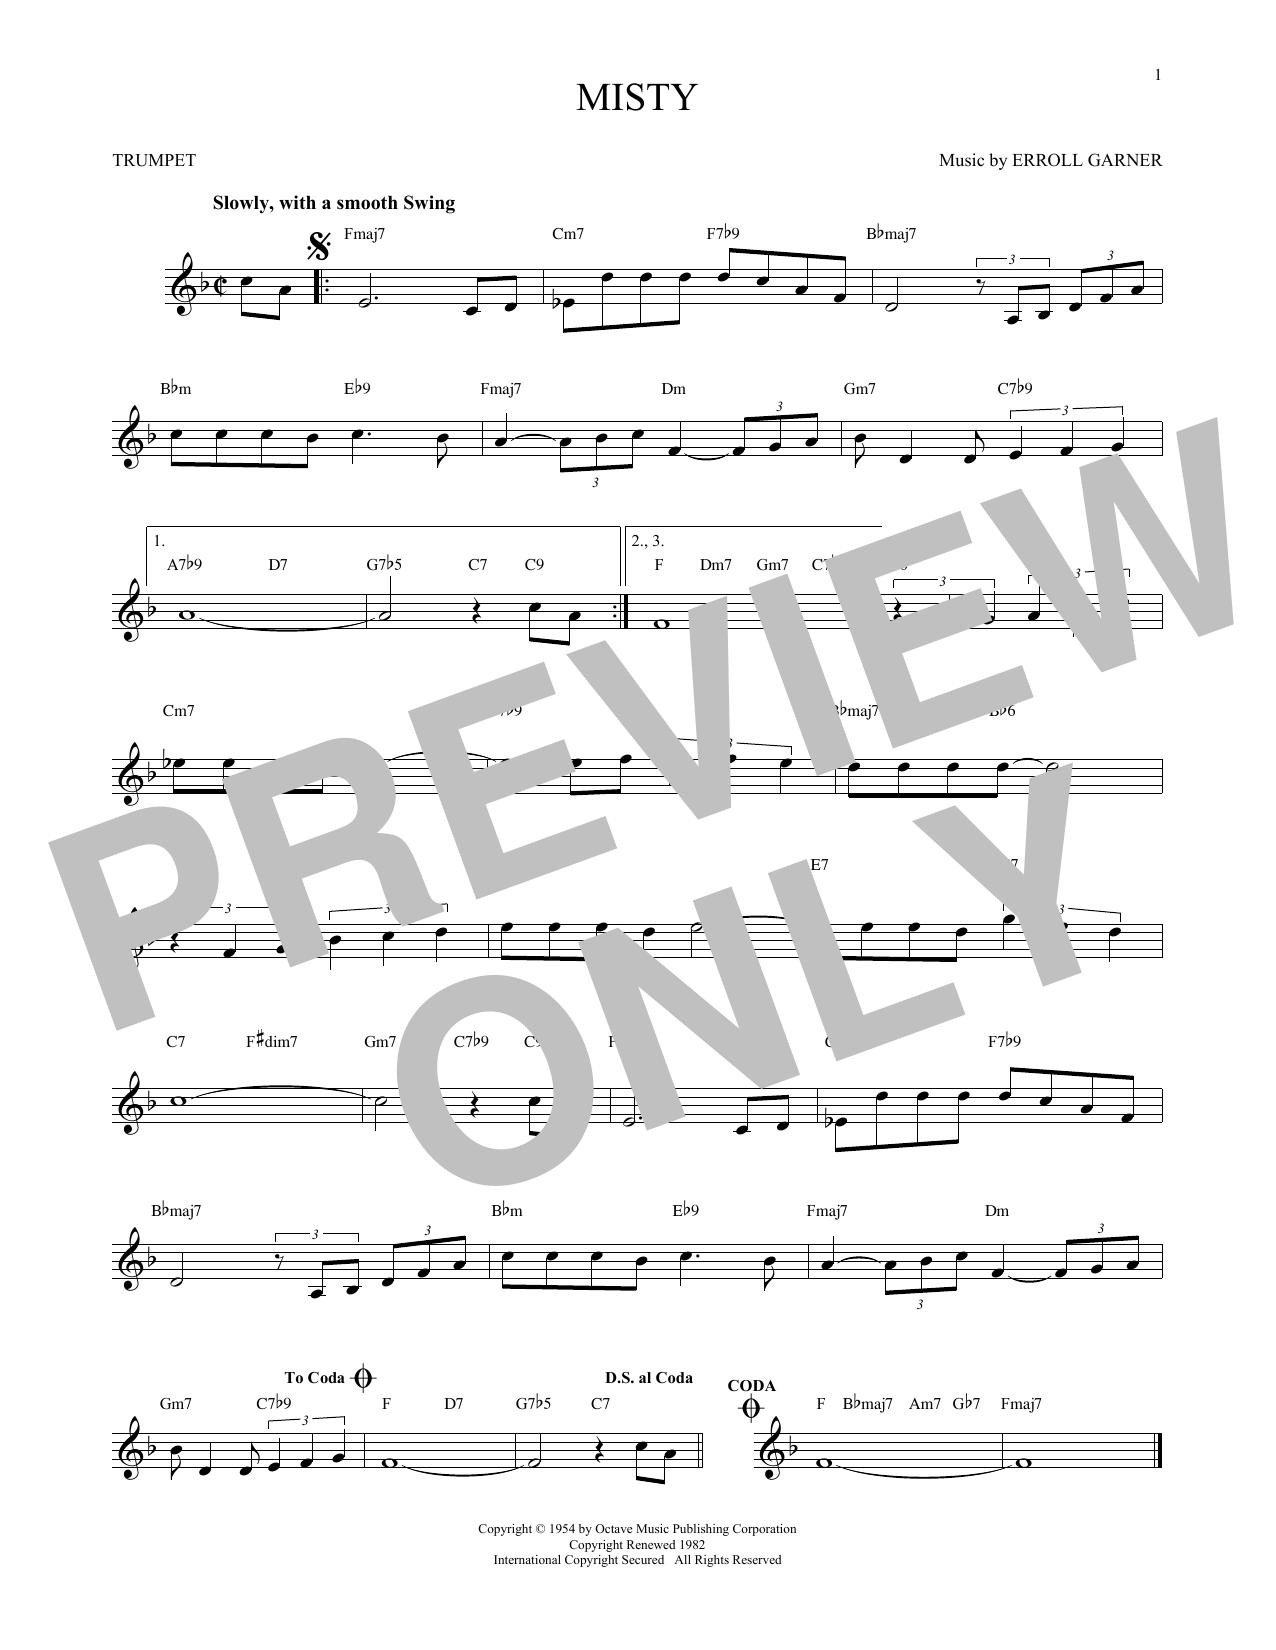 Erroll Garner 'Misty' Sheet Music Notes, Chords | Download Printable  Trumpet Solo - SKU: 171416